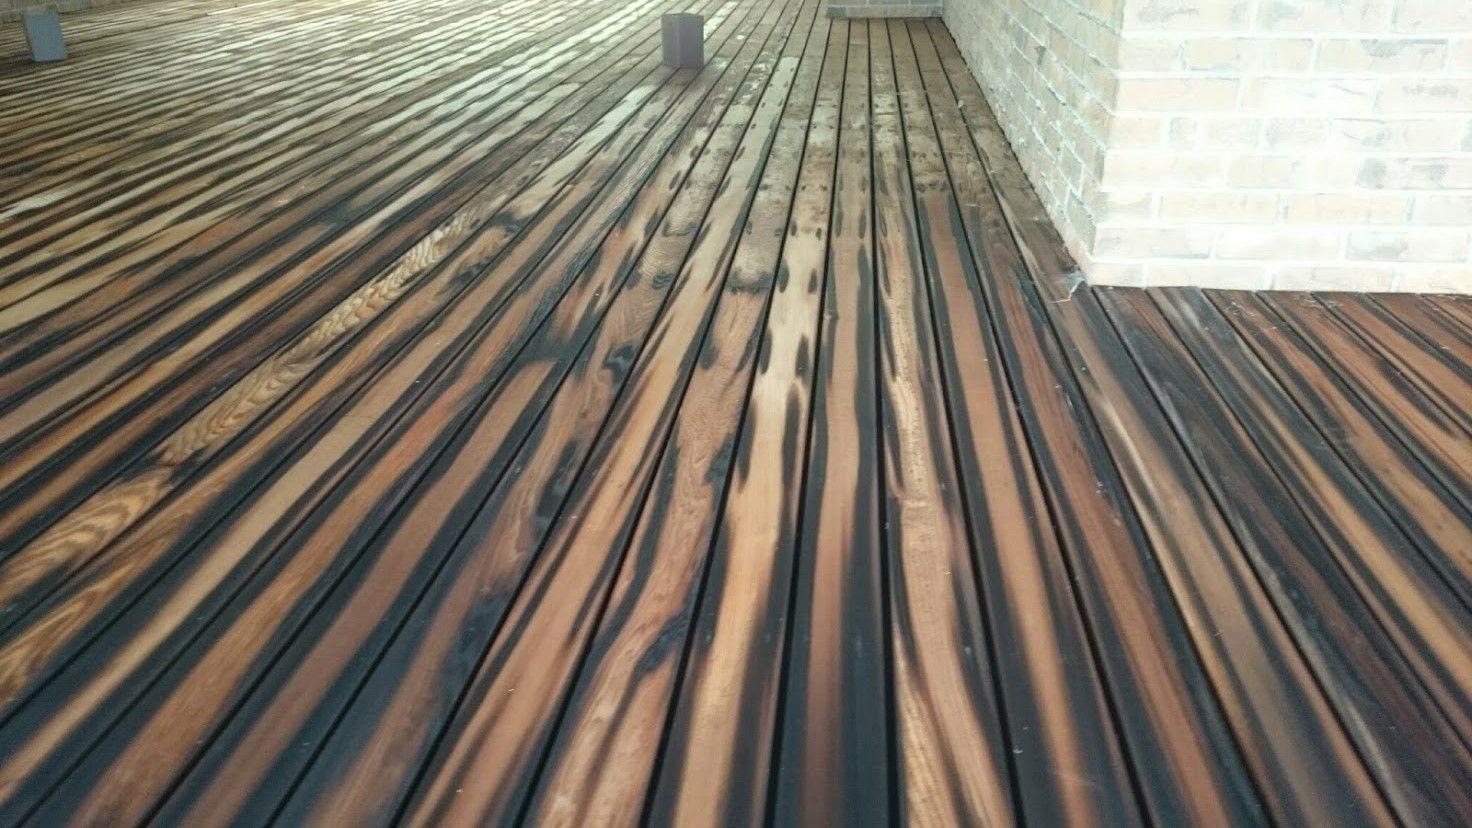 shou sugi ban drewno pinterest cedar deck decking and woodwork. Black Bedroom Furniture Sets. Home Design Ideas